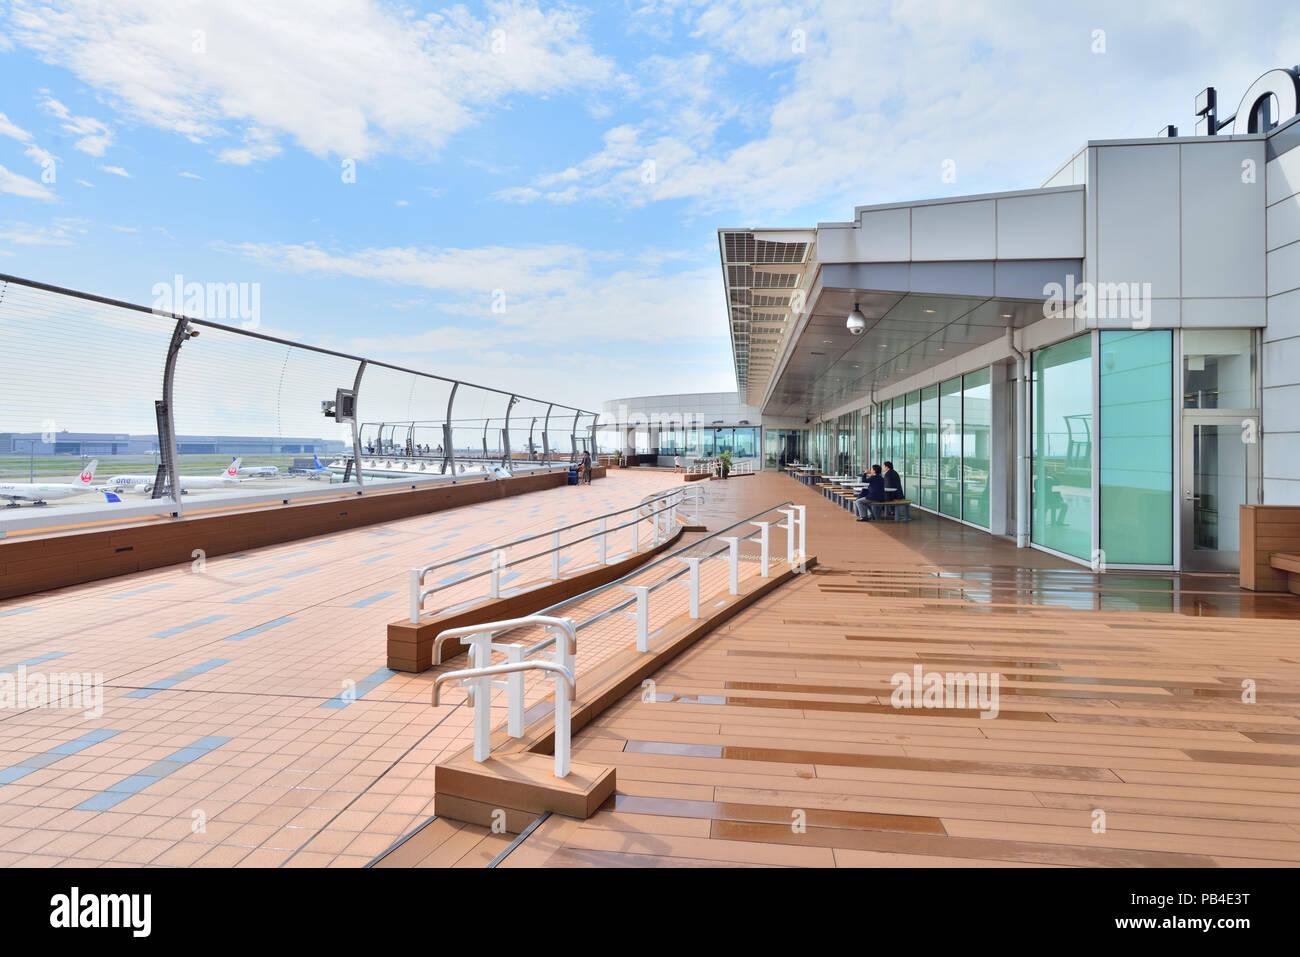 Aeroporto Tokyo : Tokyo giappone gennaio food court of haneda airport a